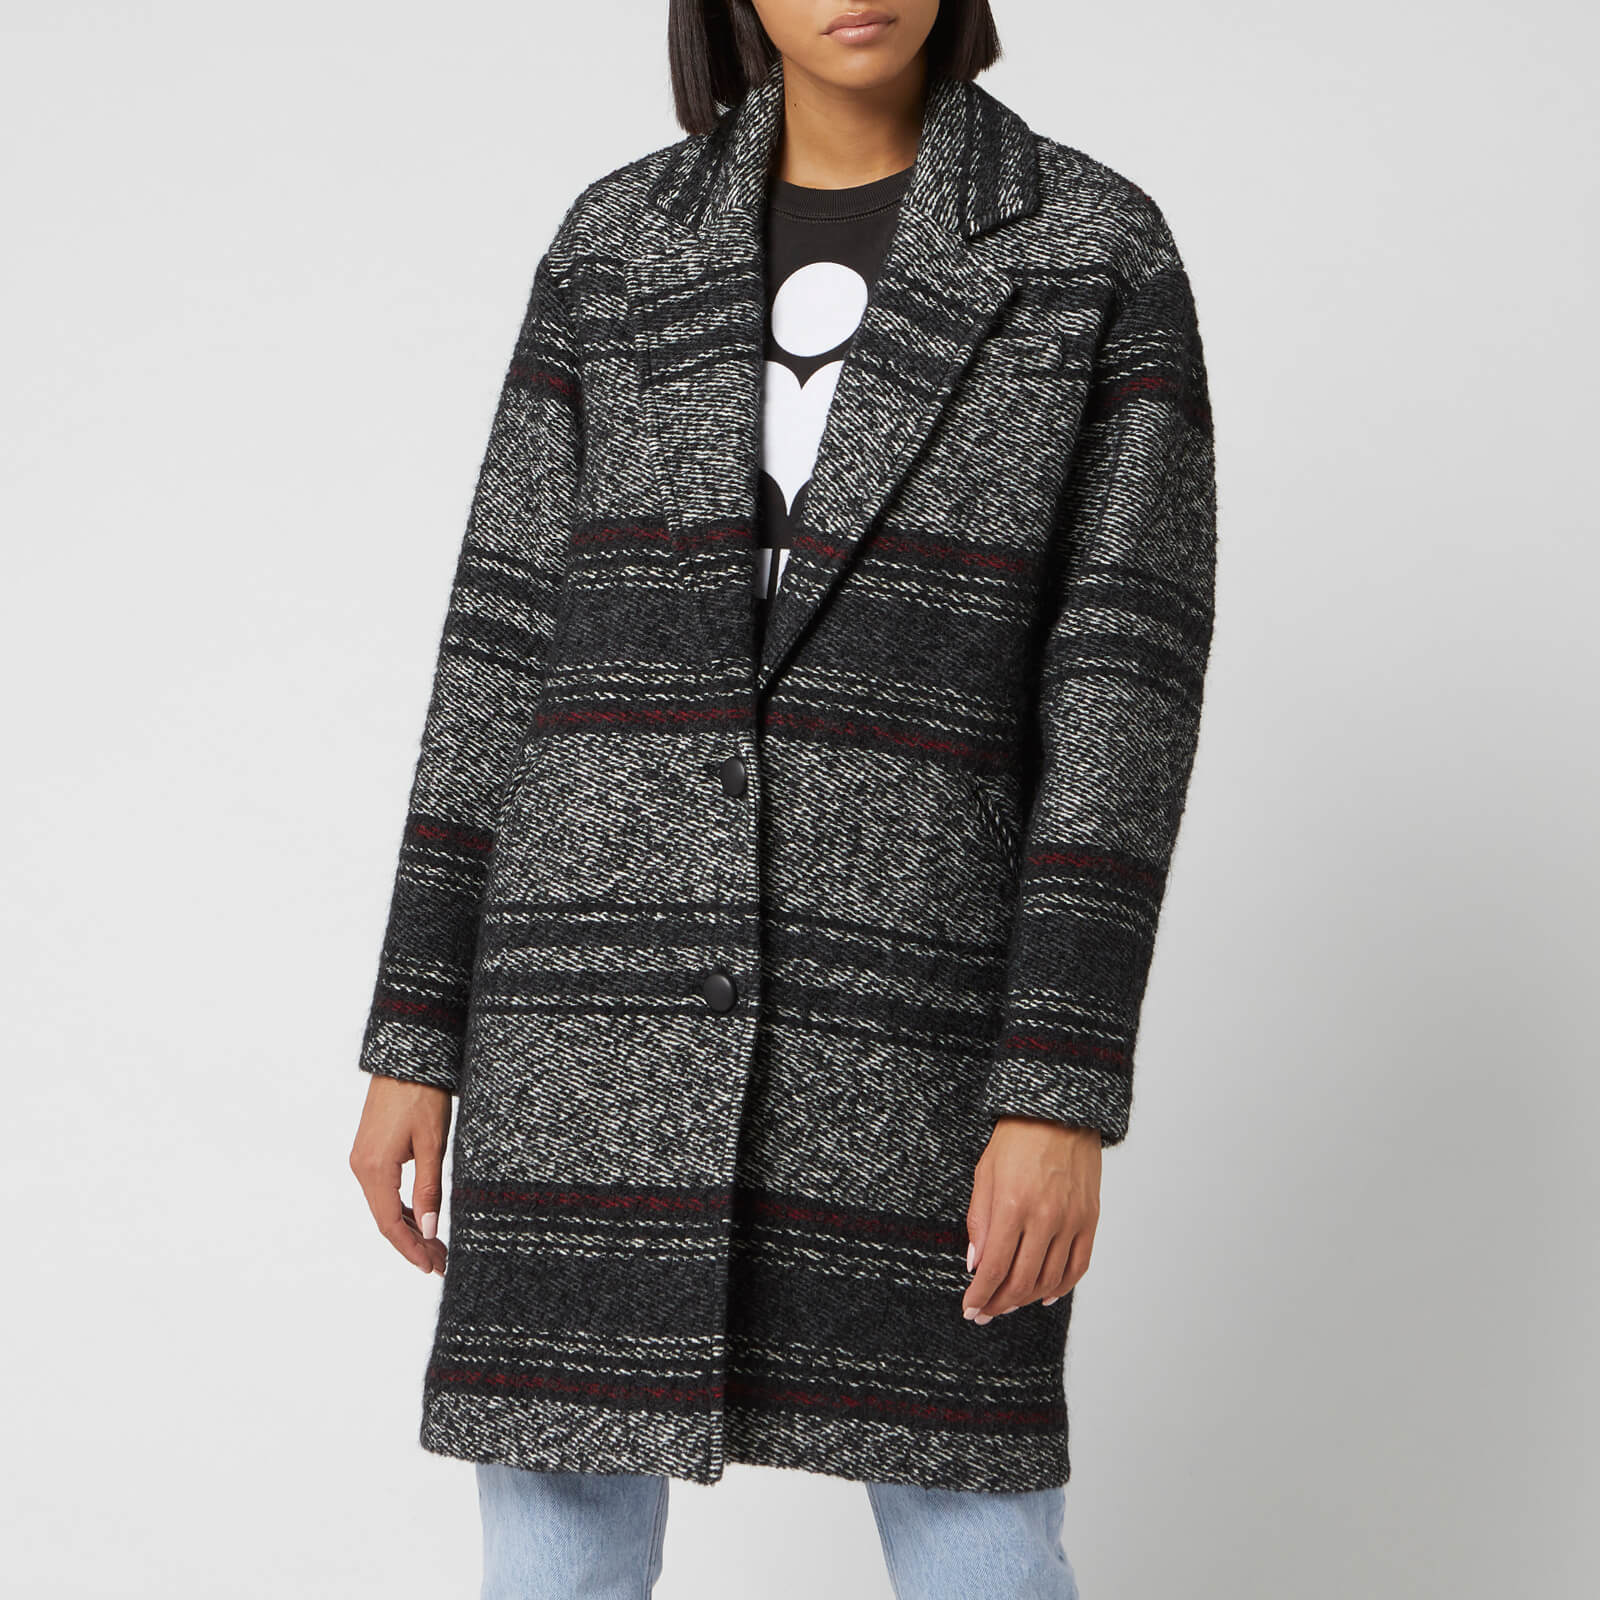 Isabel Marant Étoile Women's Dante Coat - Faded Black - FR 34/UK 6 - Black